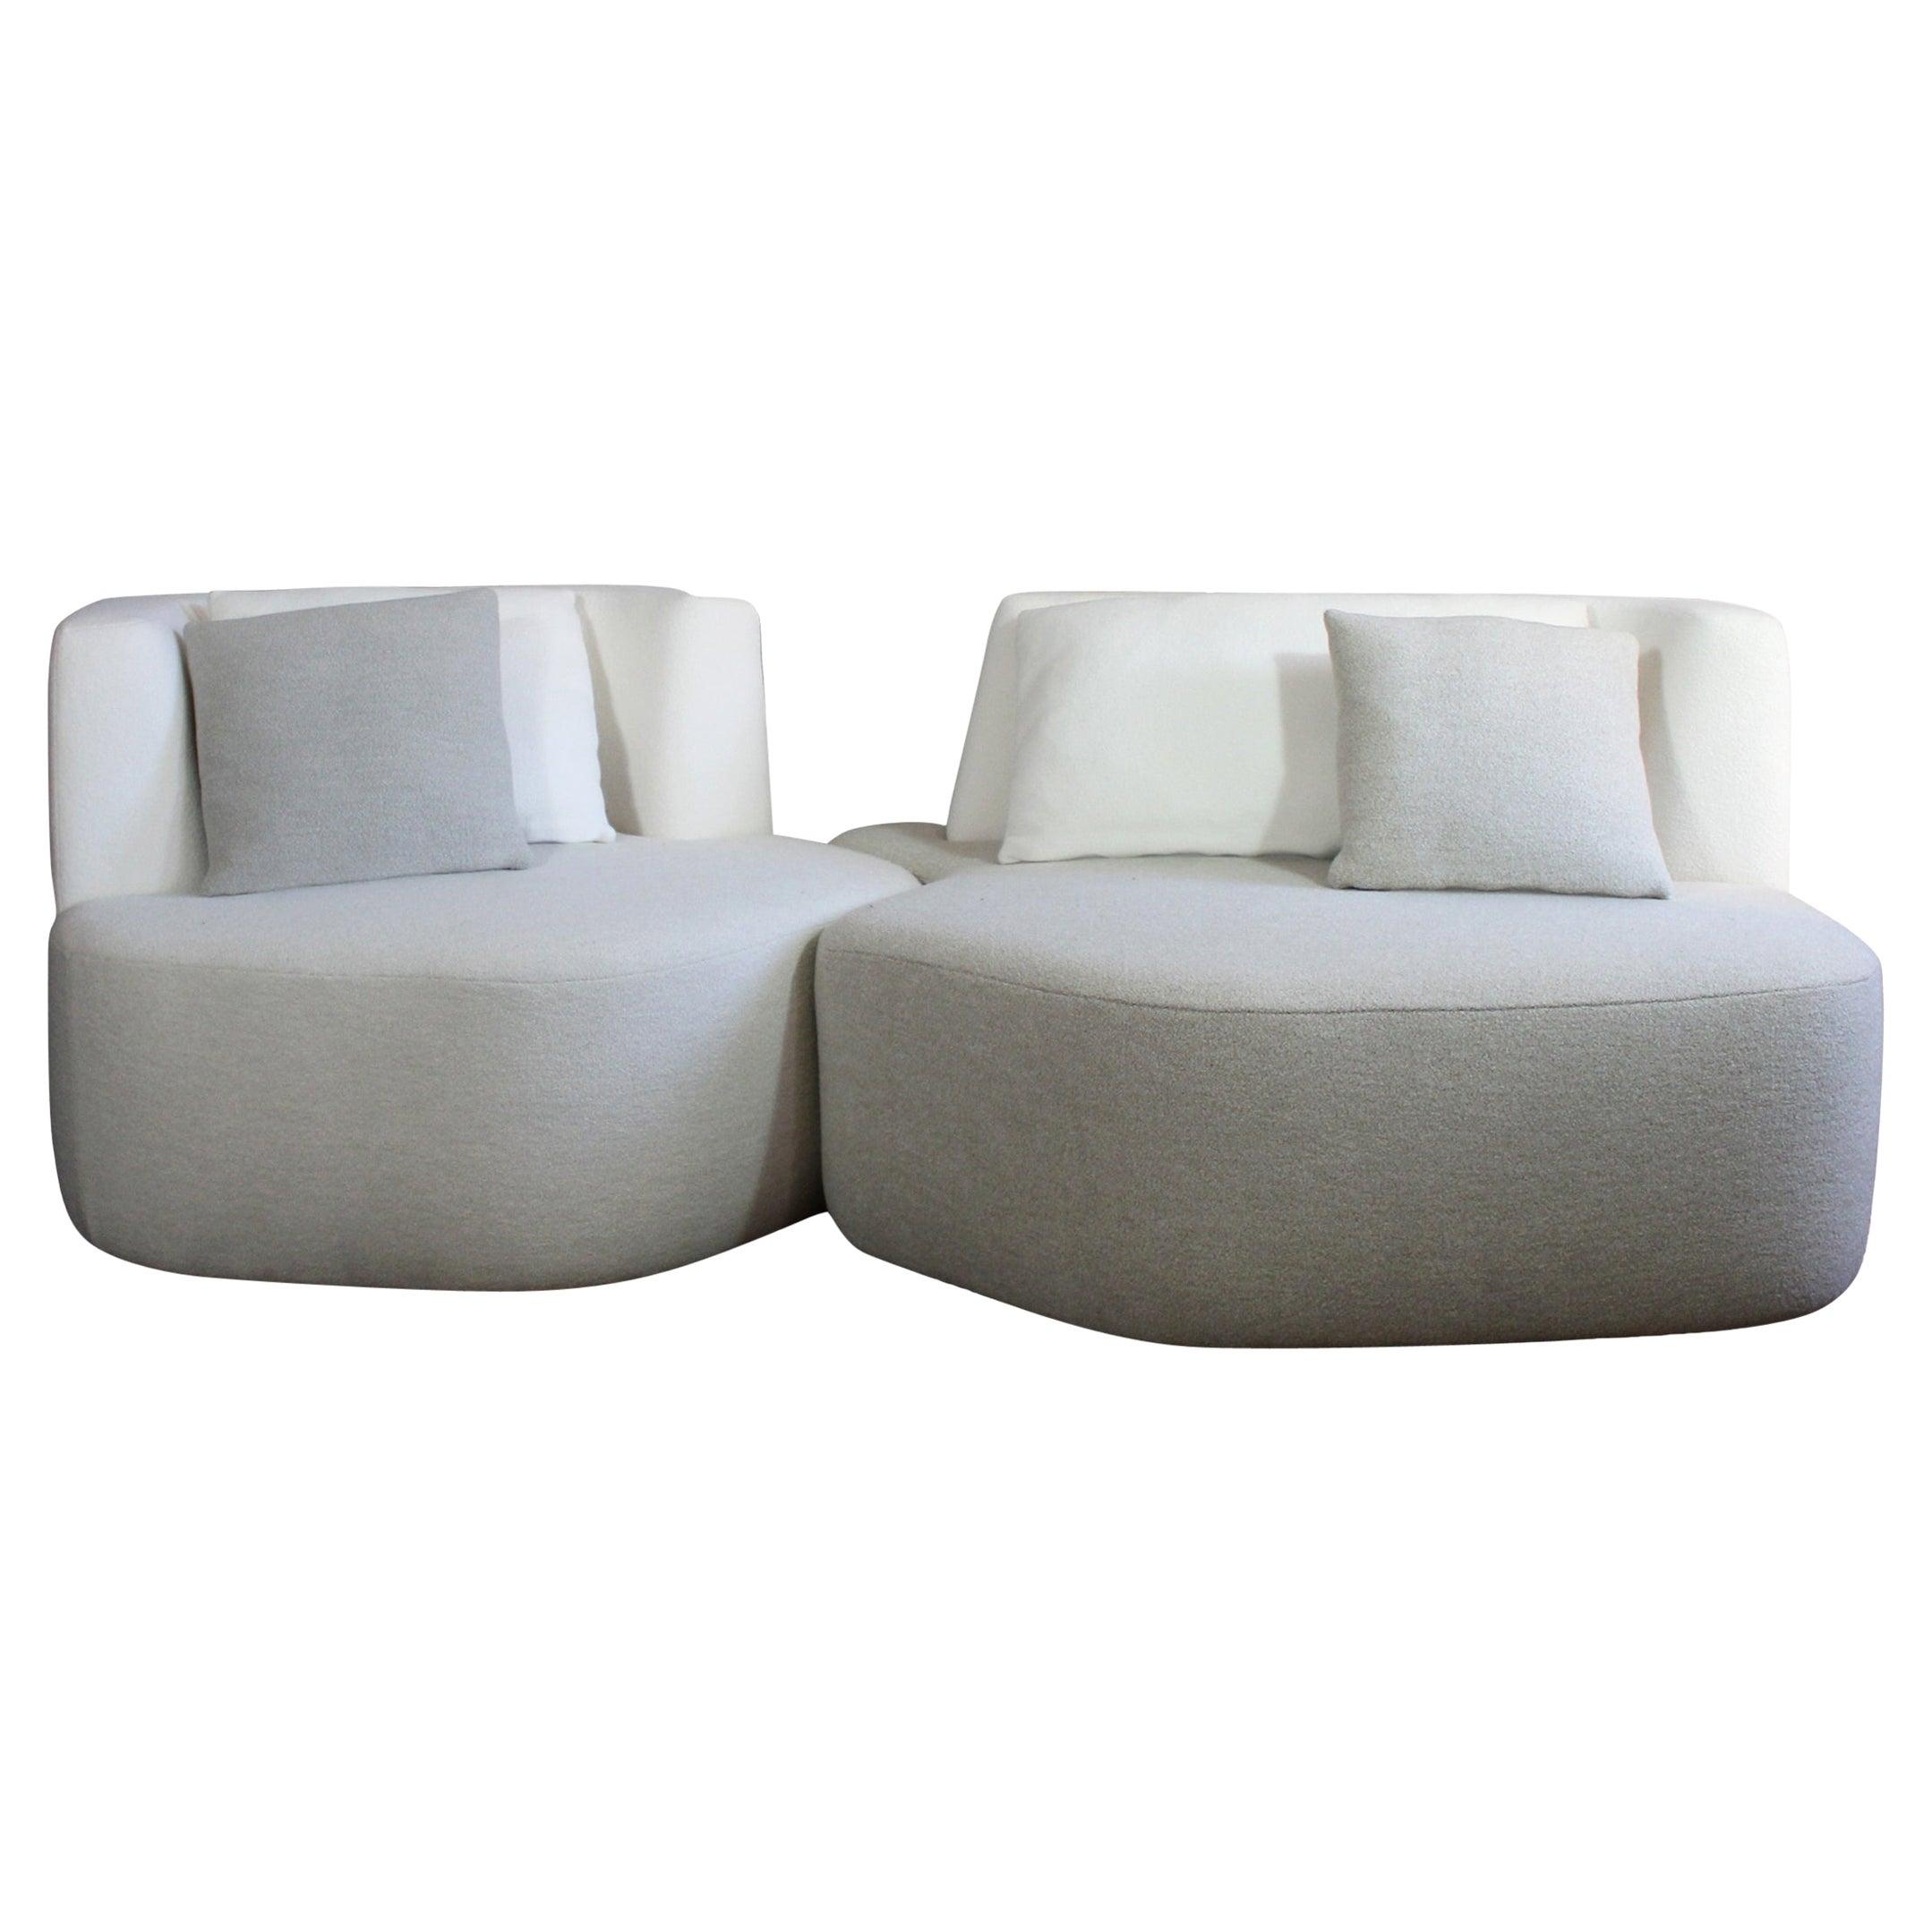 Bespoke Organic Sofa in White Cream Wool 2 Modules Made in France Customizable